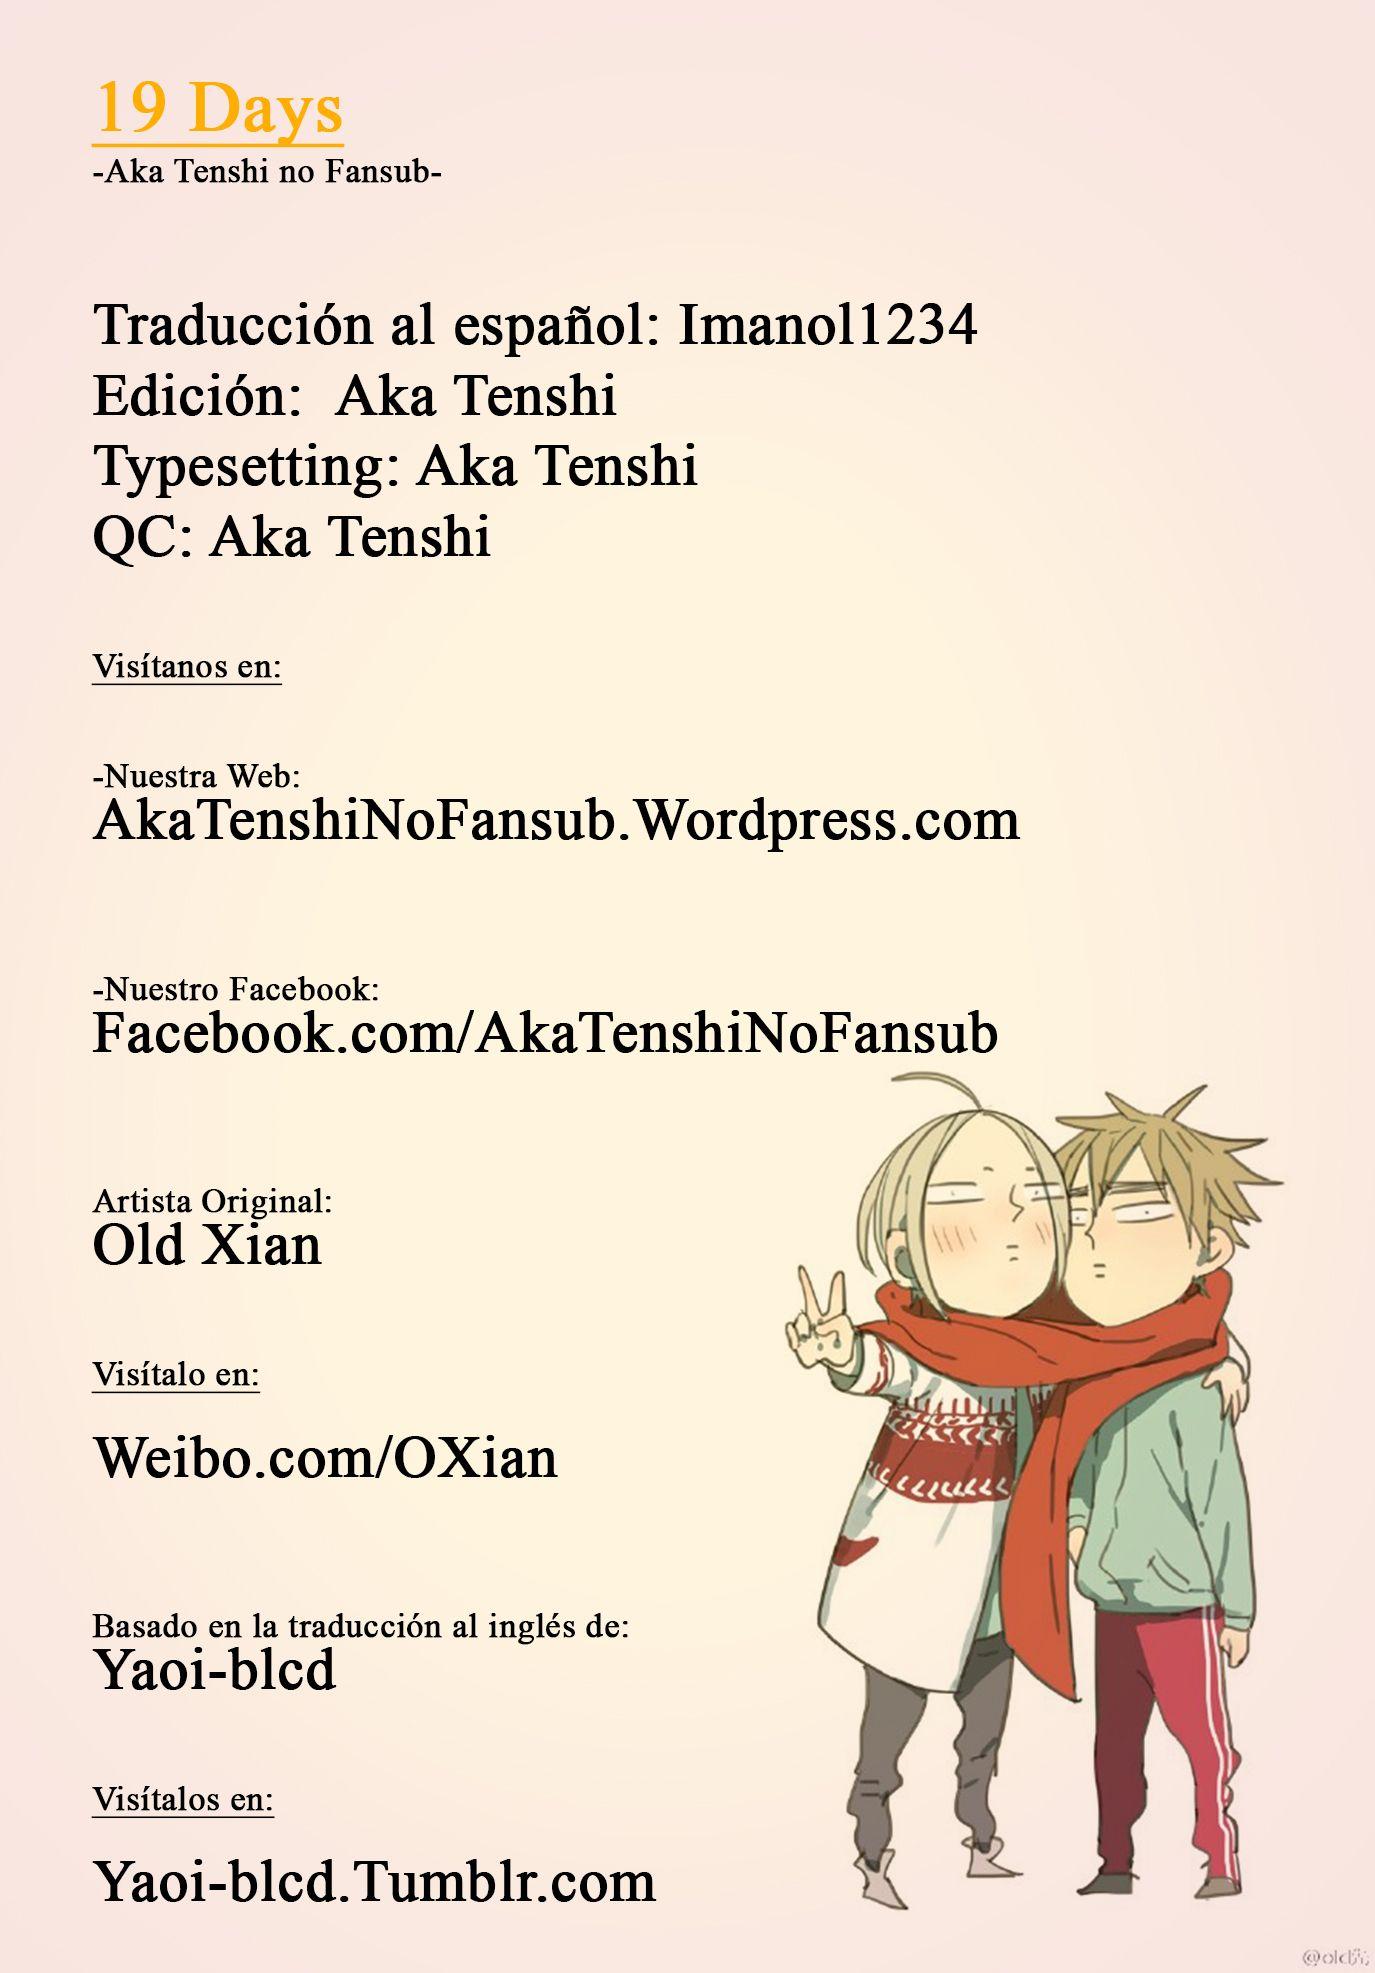 http://c5.ninemanga.com/es_manga/7/15943/454420/6666371f68d373799e9a861fdb69717e.jpg Page 1